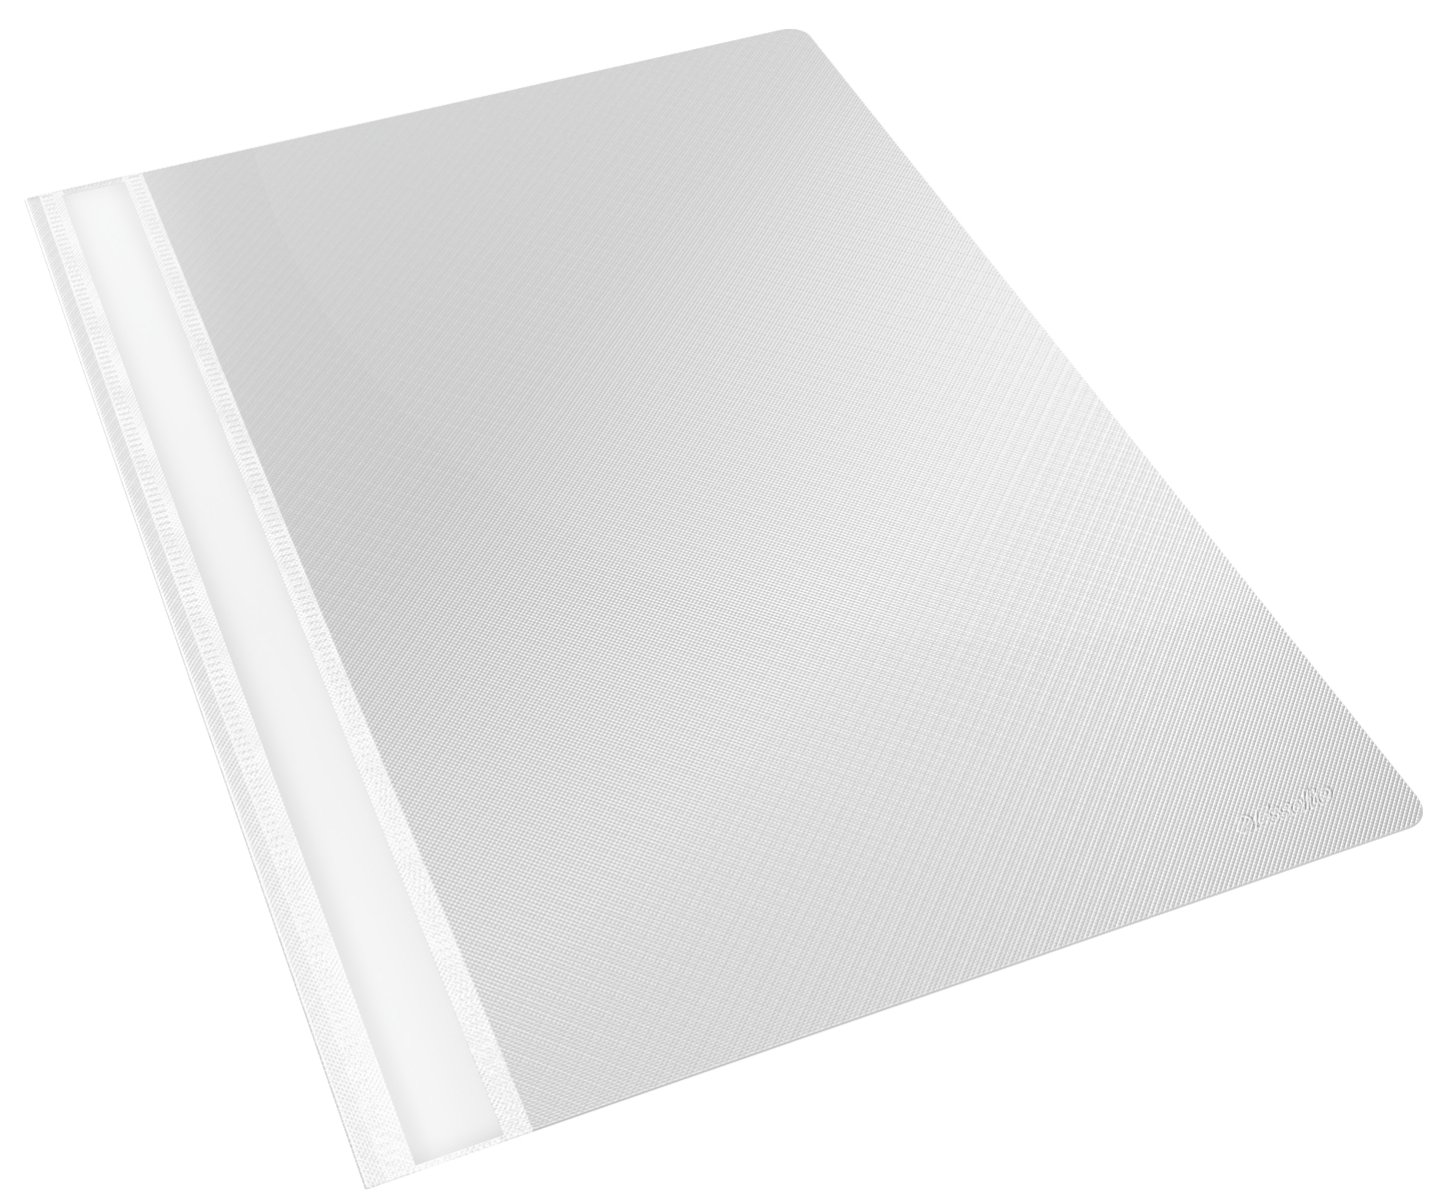 Esselte-Leitz - Cartella in polipropilene, 25 pezzi, formato A4, bianco 15382